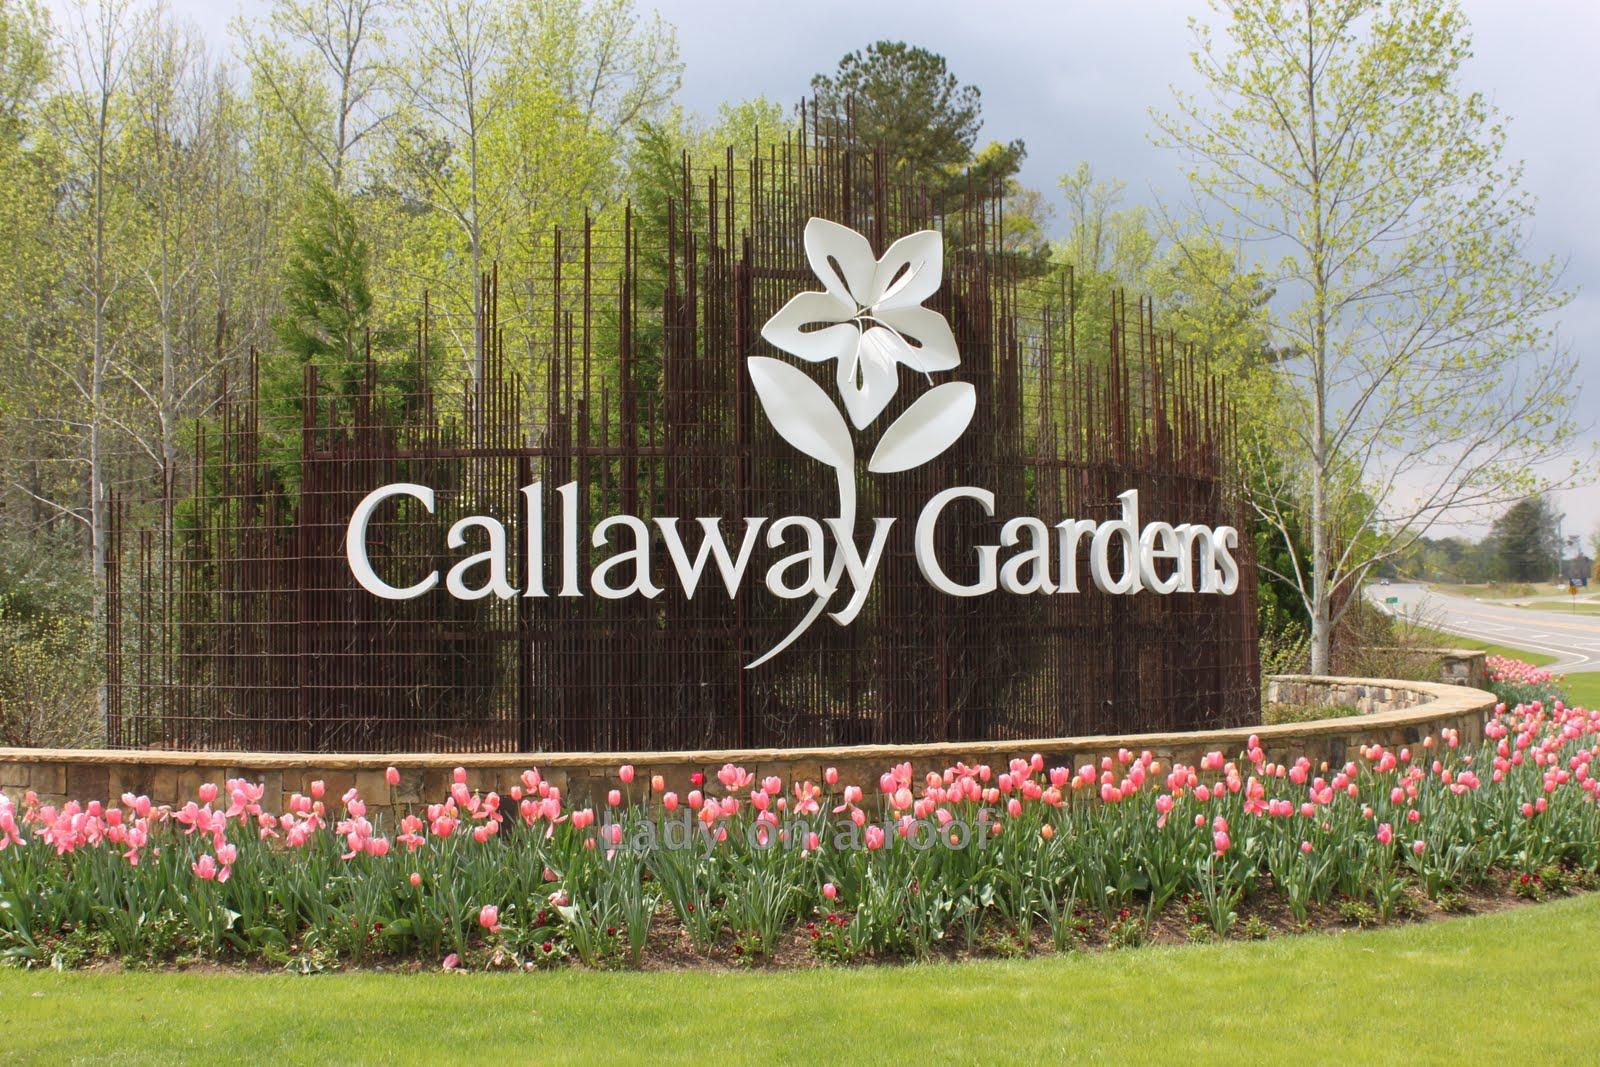 Day Trip To Callaway Gardens | Official Georgia Tourism U0026 Travel Website |  Explore Georgia.org Good Looking